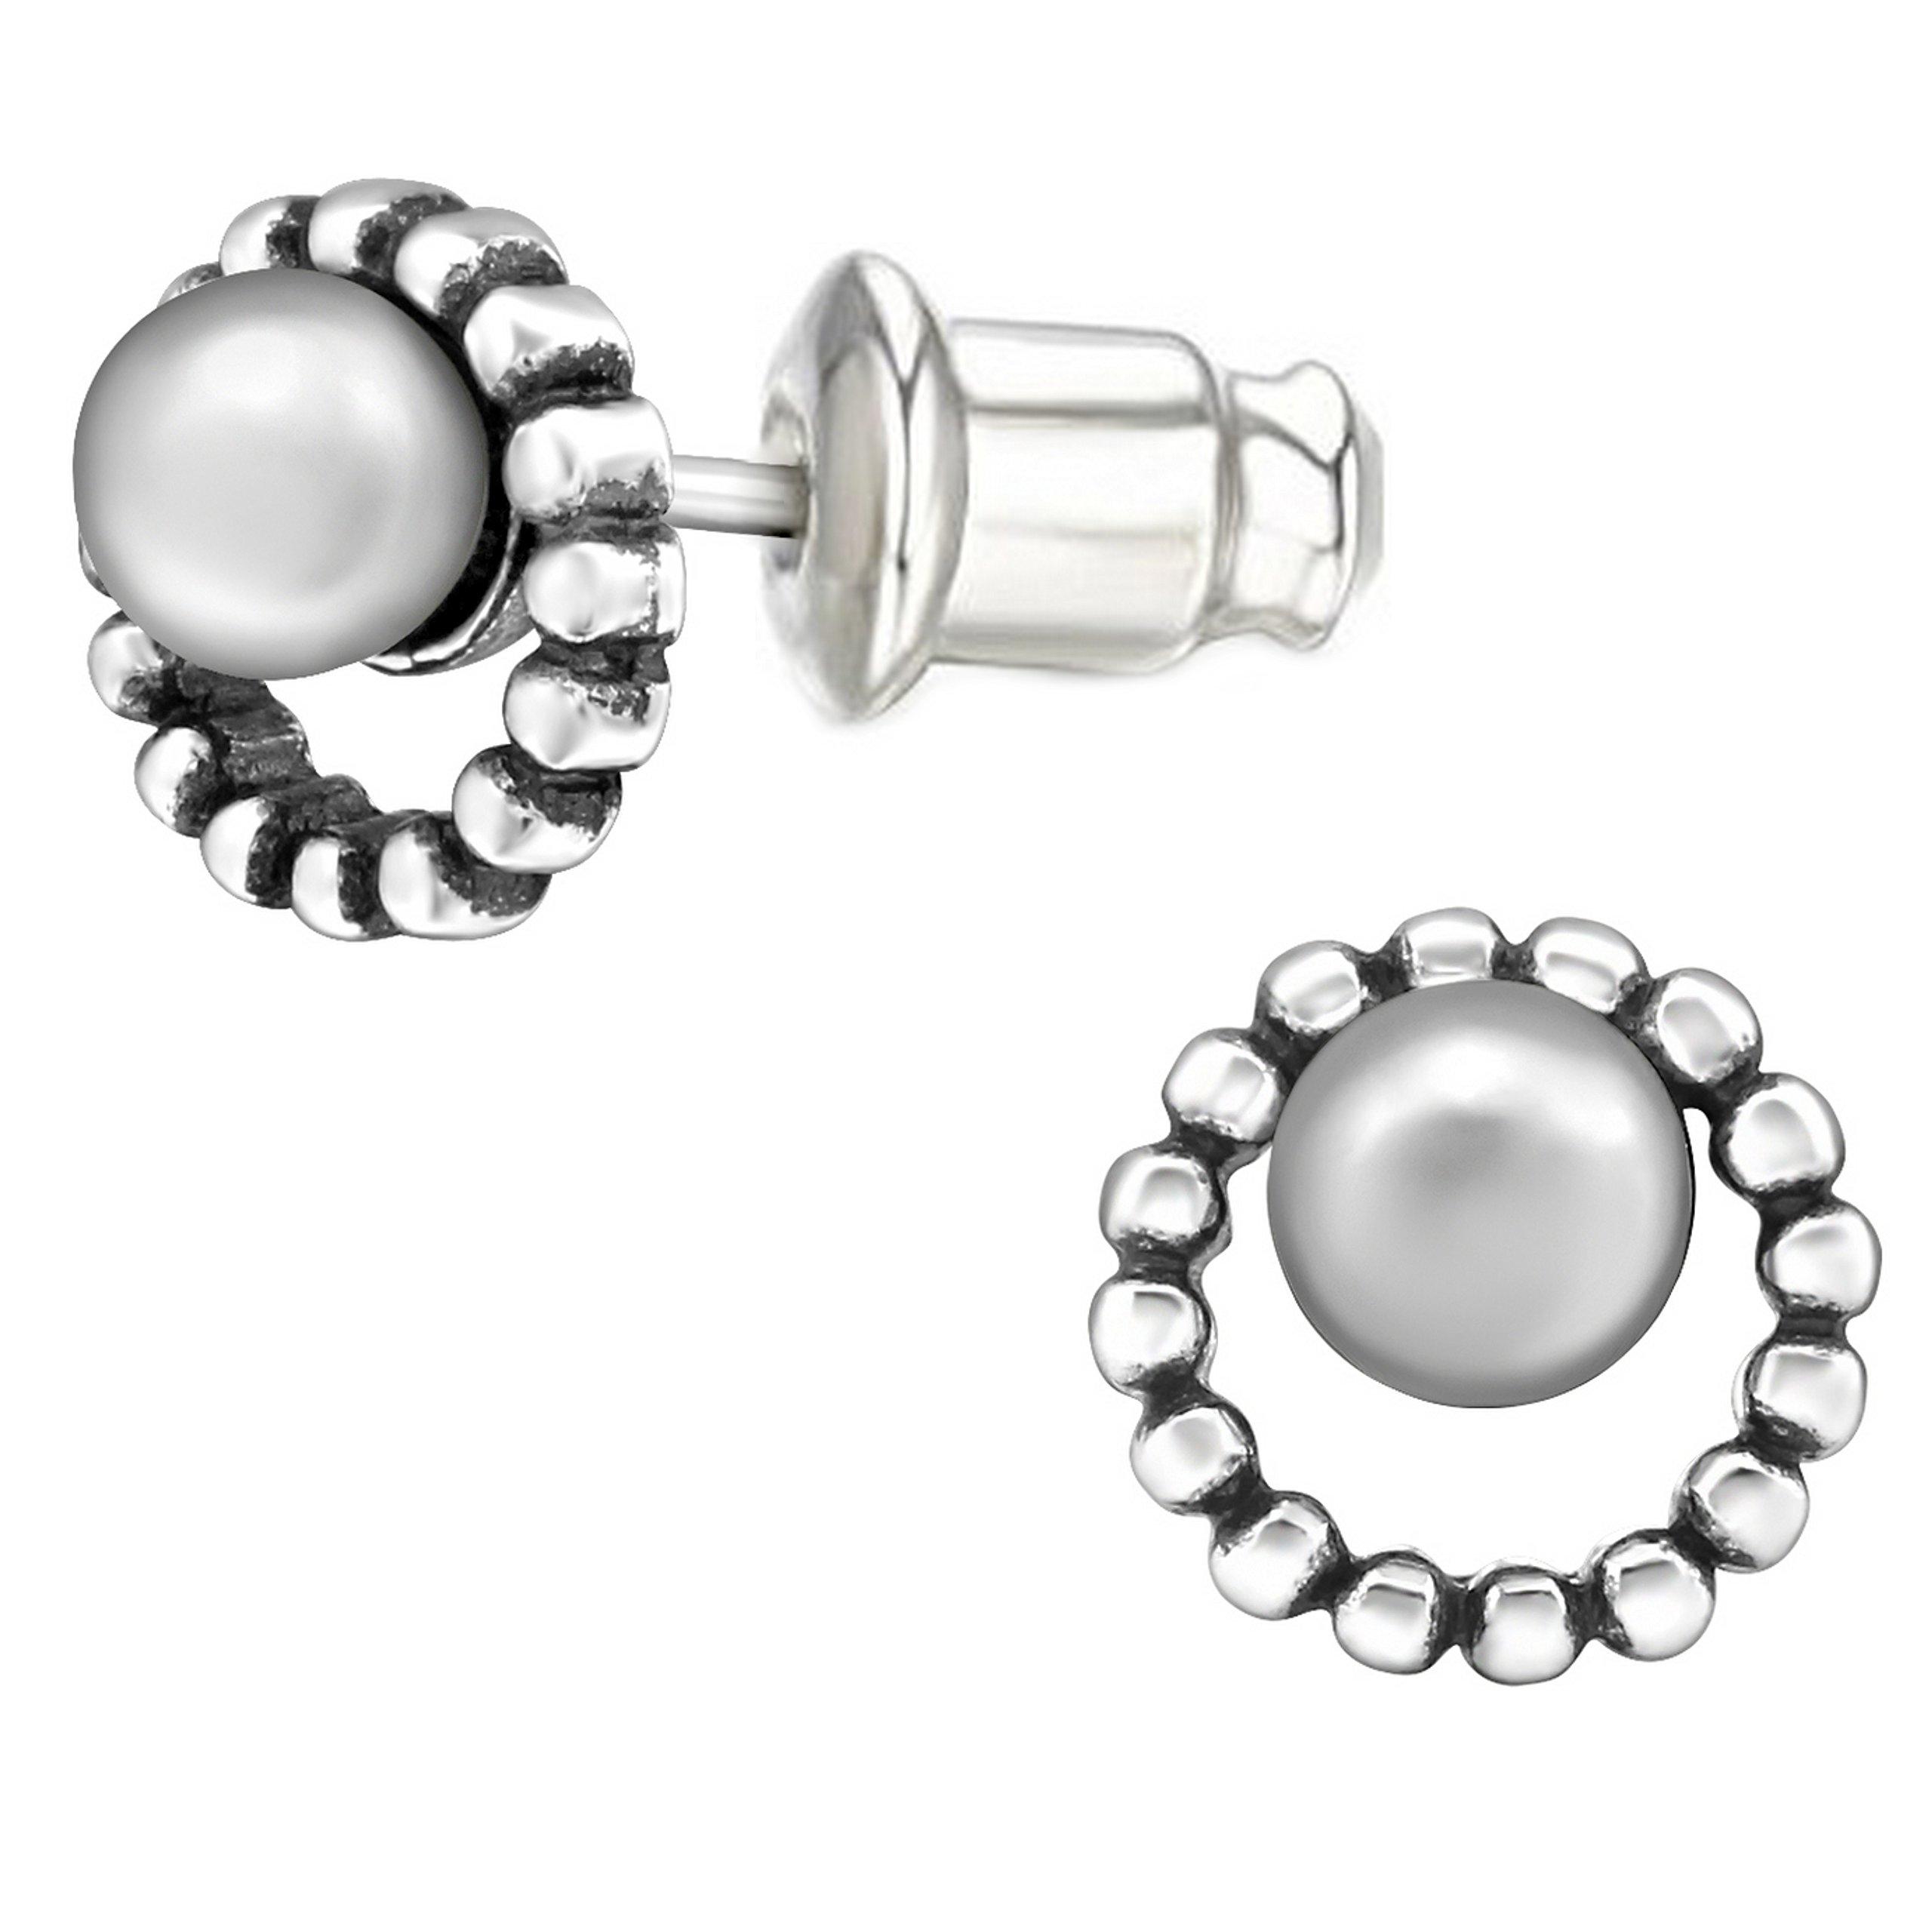 Pro Jewelry .925 Sterling Silver ''Round w/ Glass Pearl'' Stud Earrings with Bullet Clutch Earring Backs